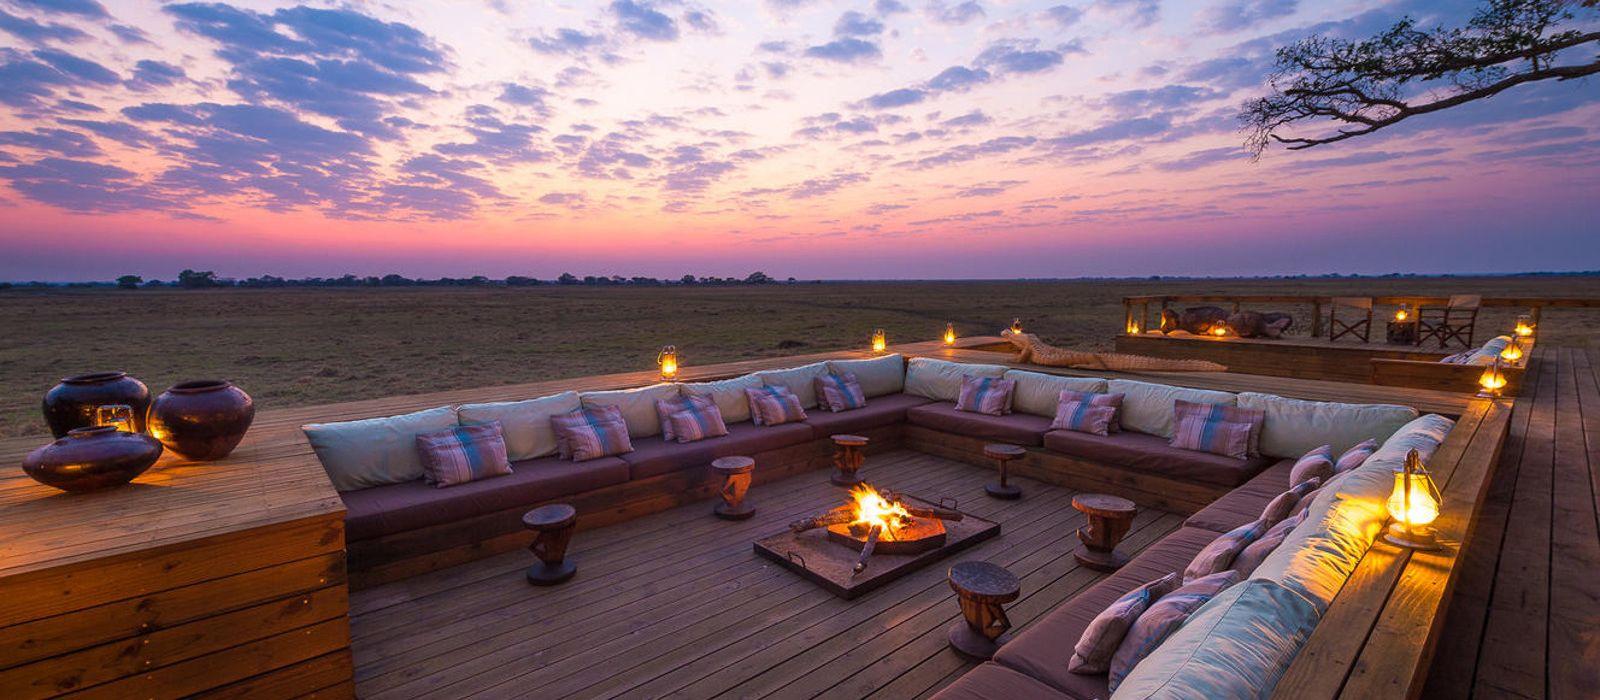 Hotel Shumba Camp Zambia